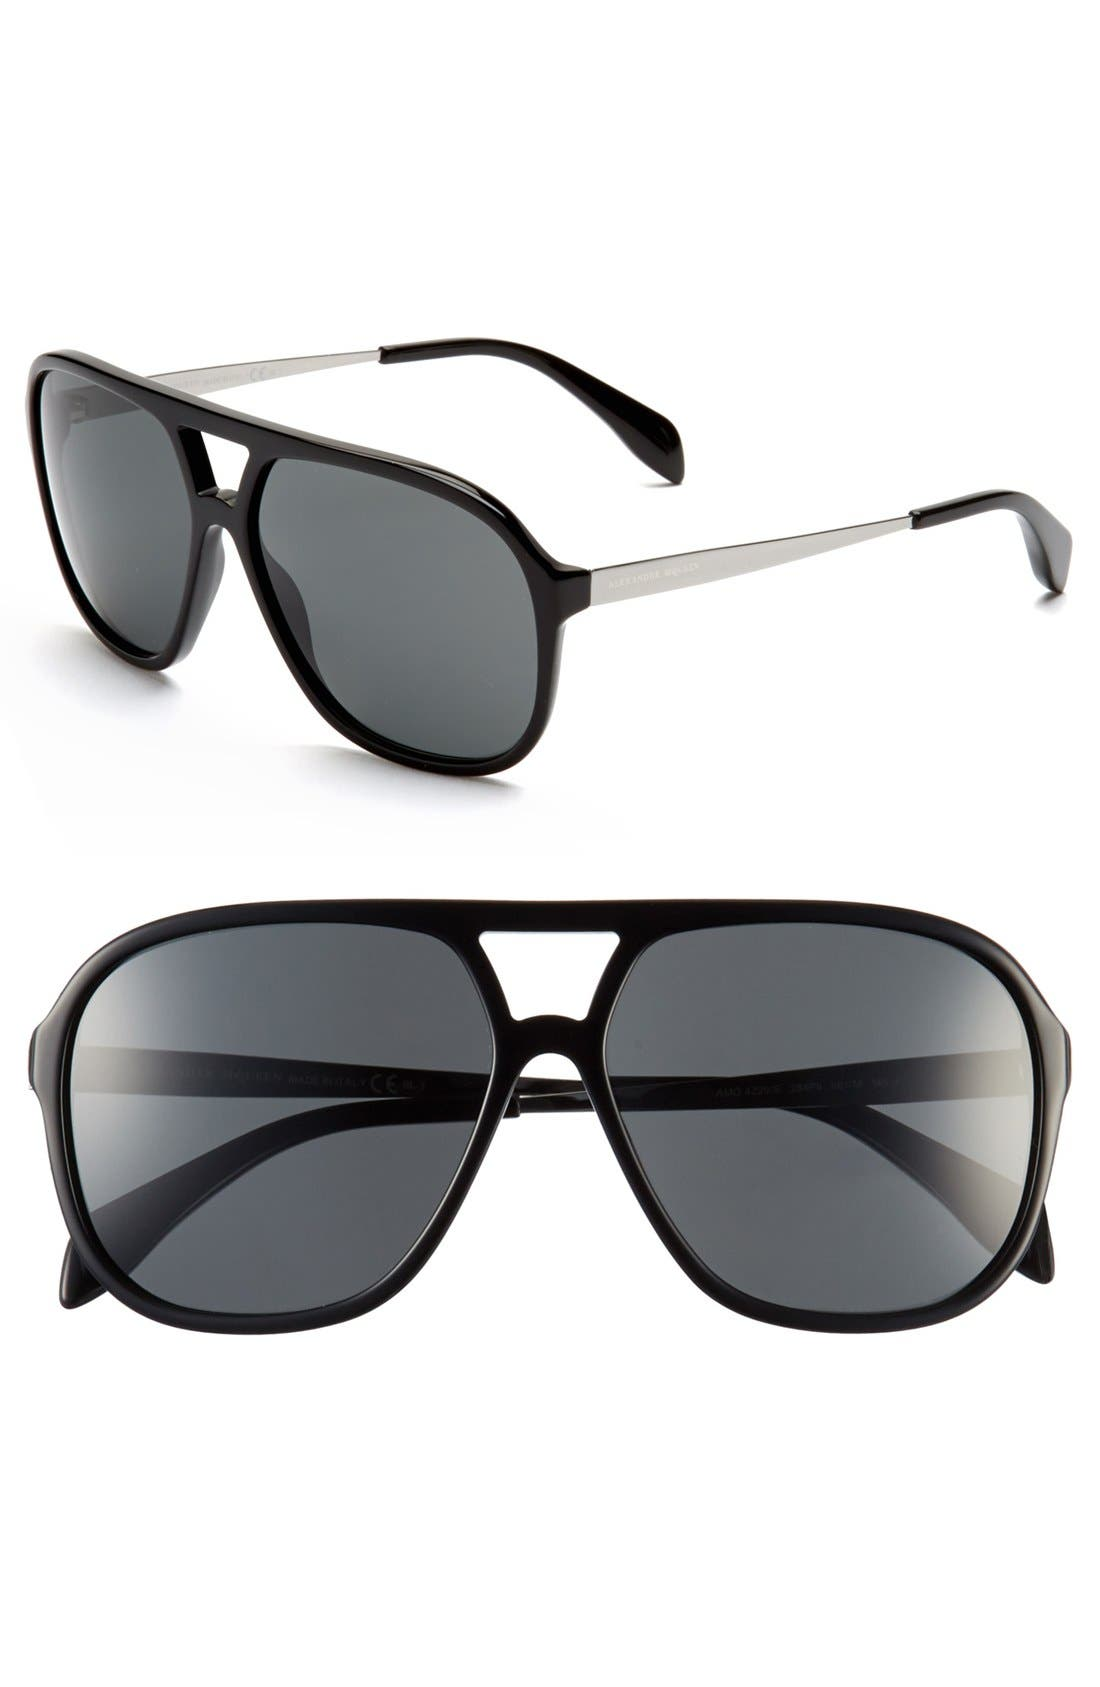 Main Image - Alexander McQueen 60mm Aviator Sunglasses